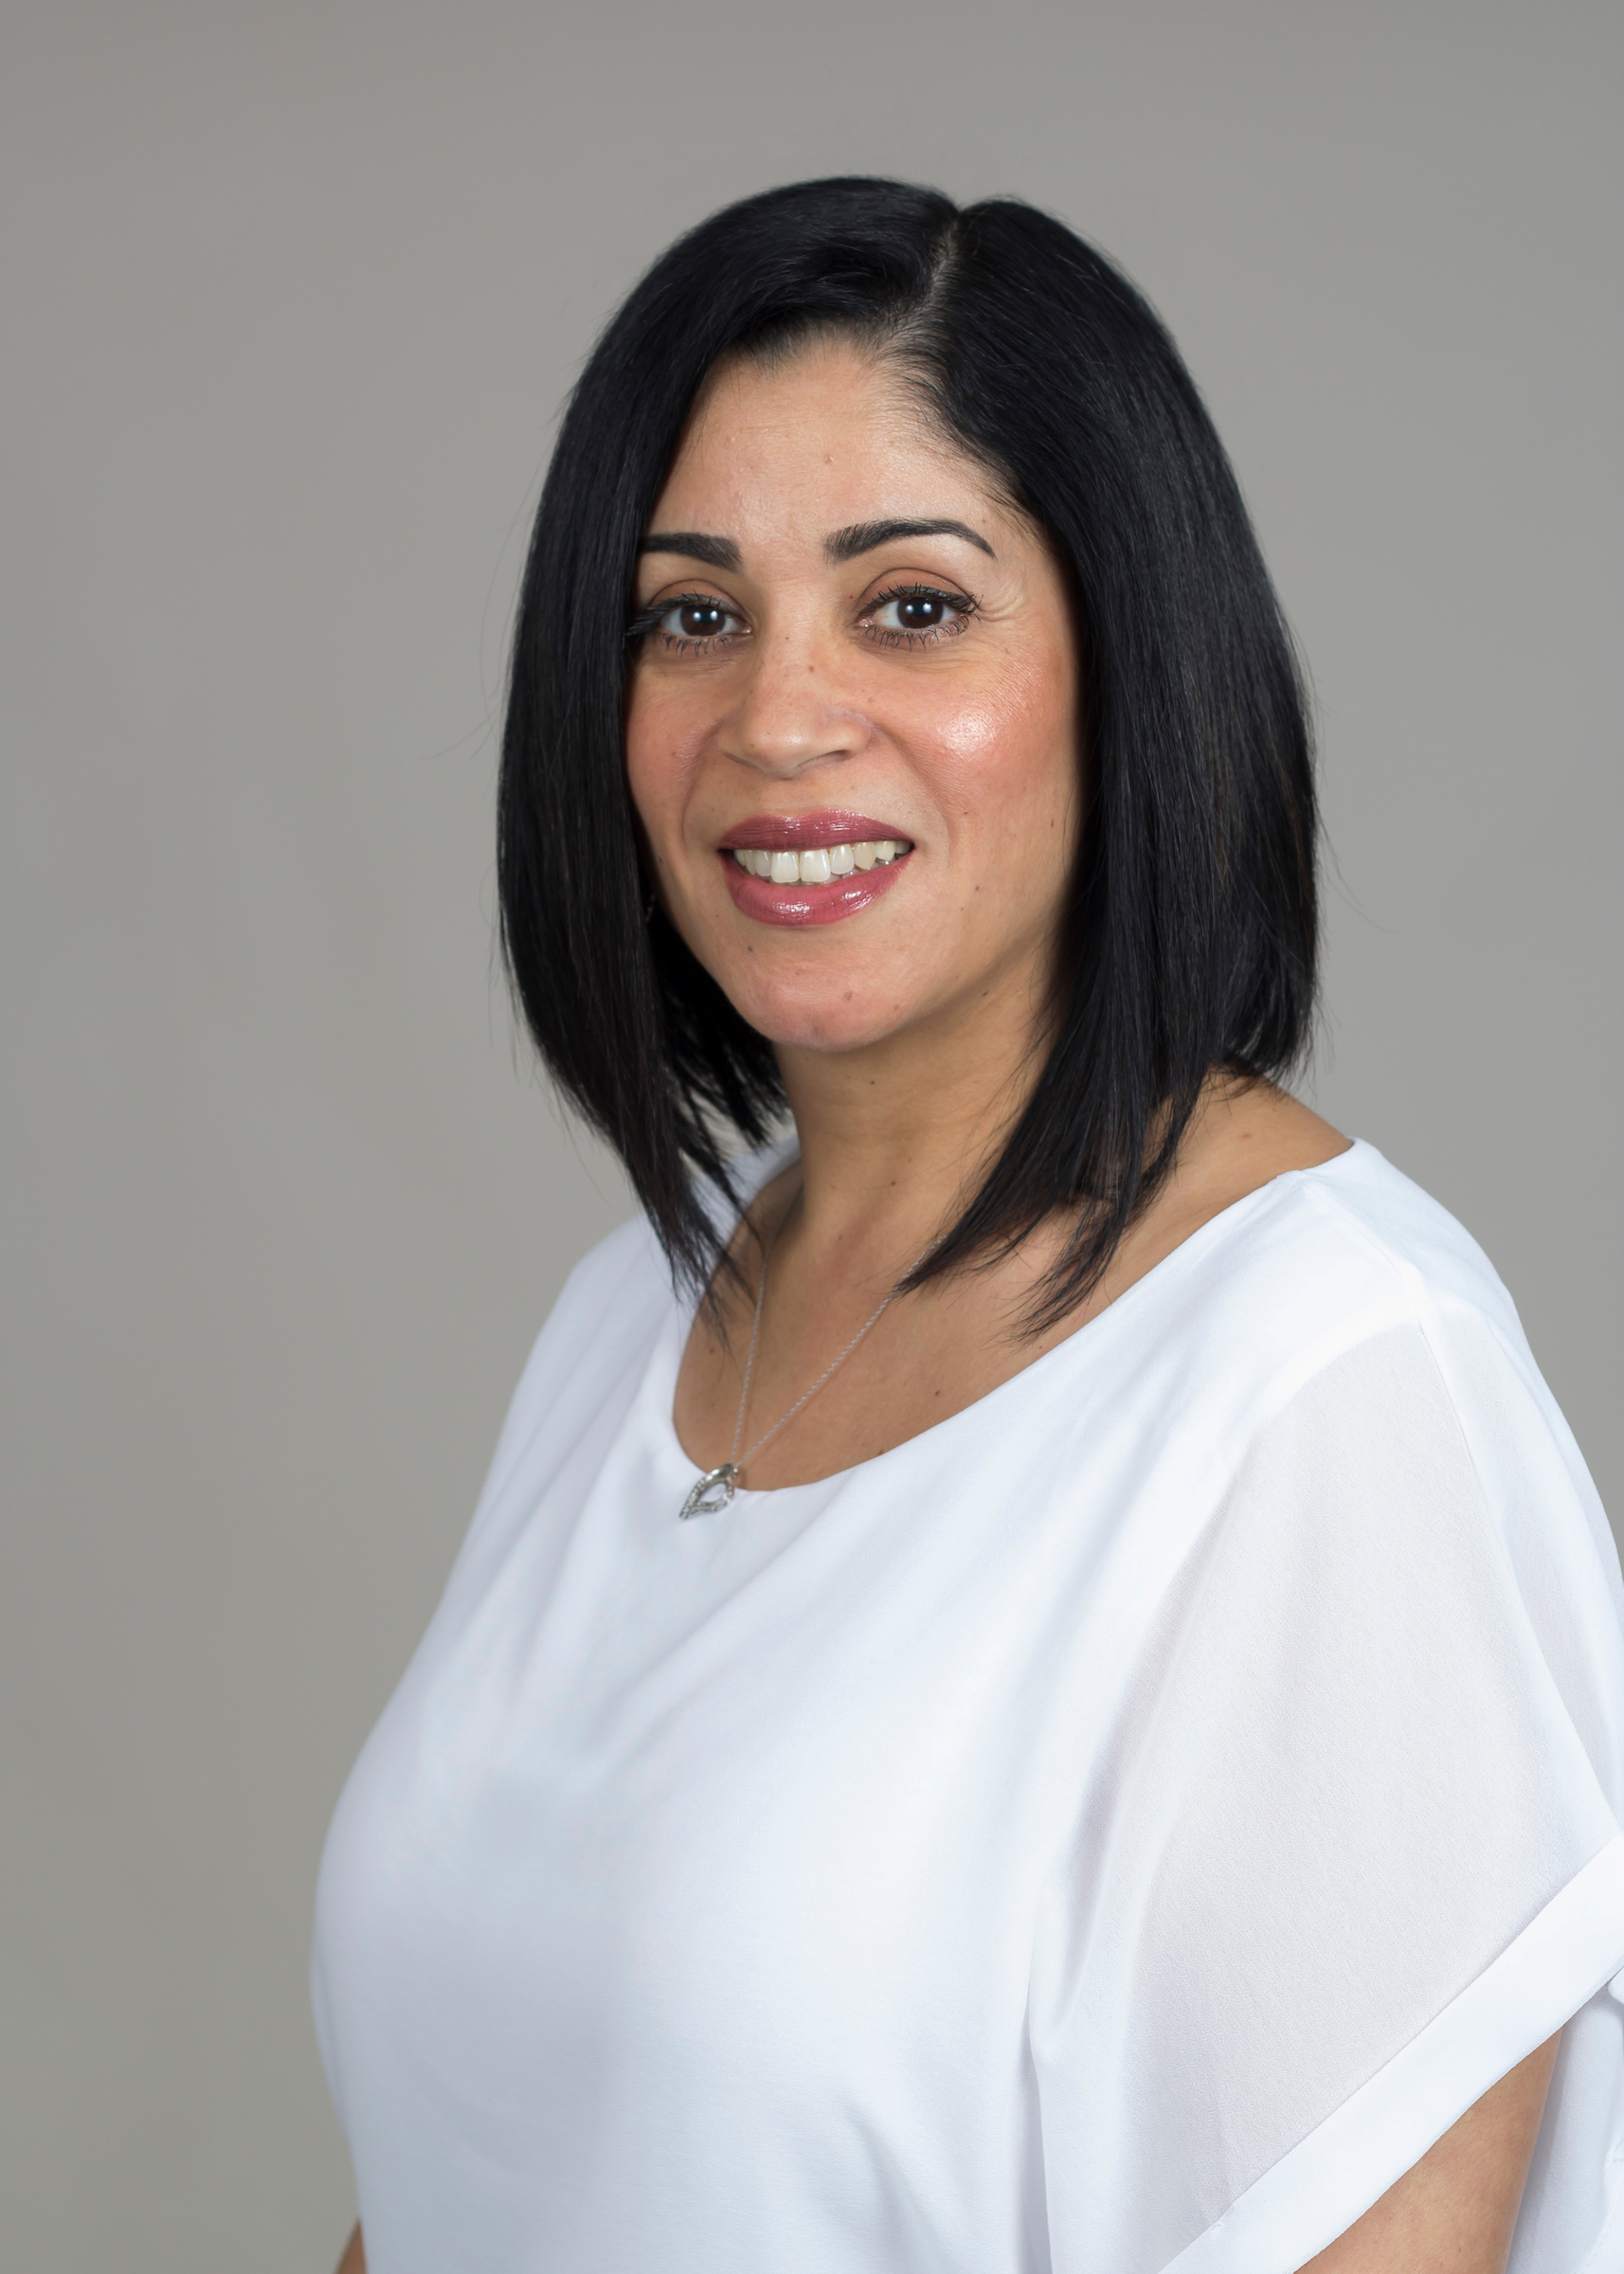 Brenda d justice for president 2020 - 3 7